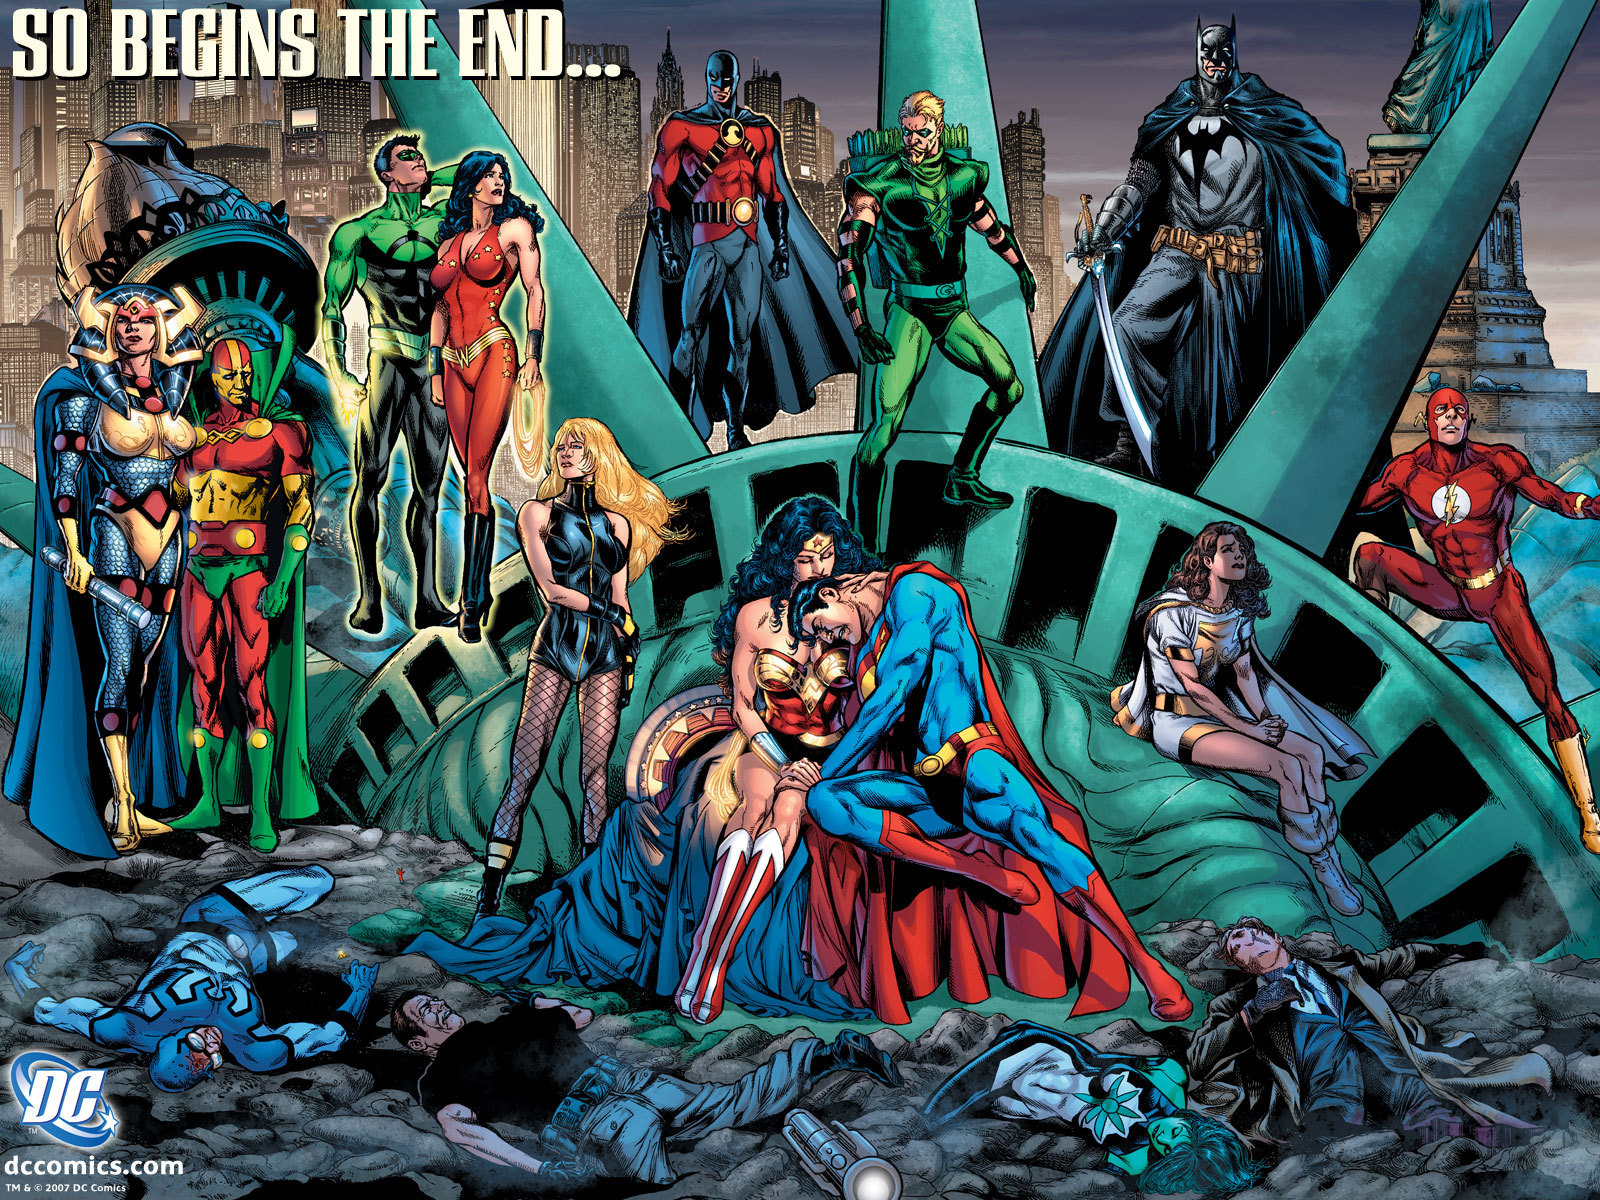 Dc Comics Wallpapers, 45 Free Modern Dc Comics Wallpapers ...